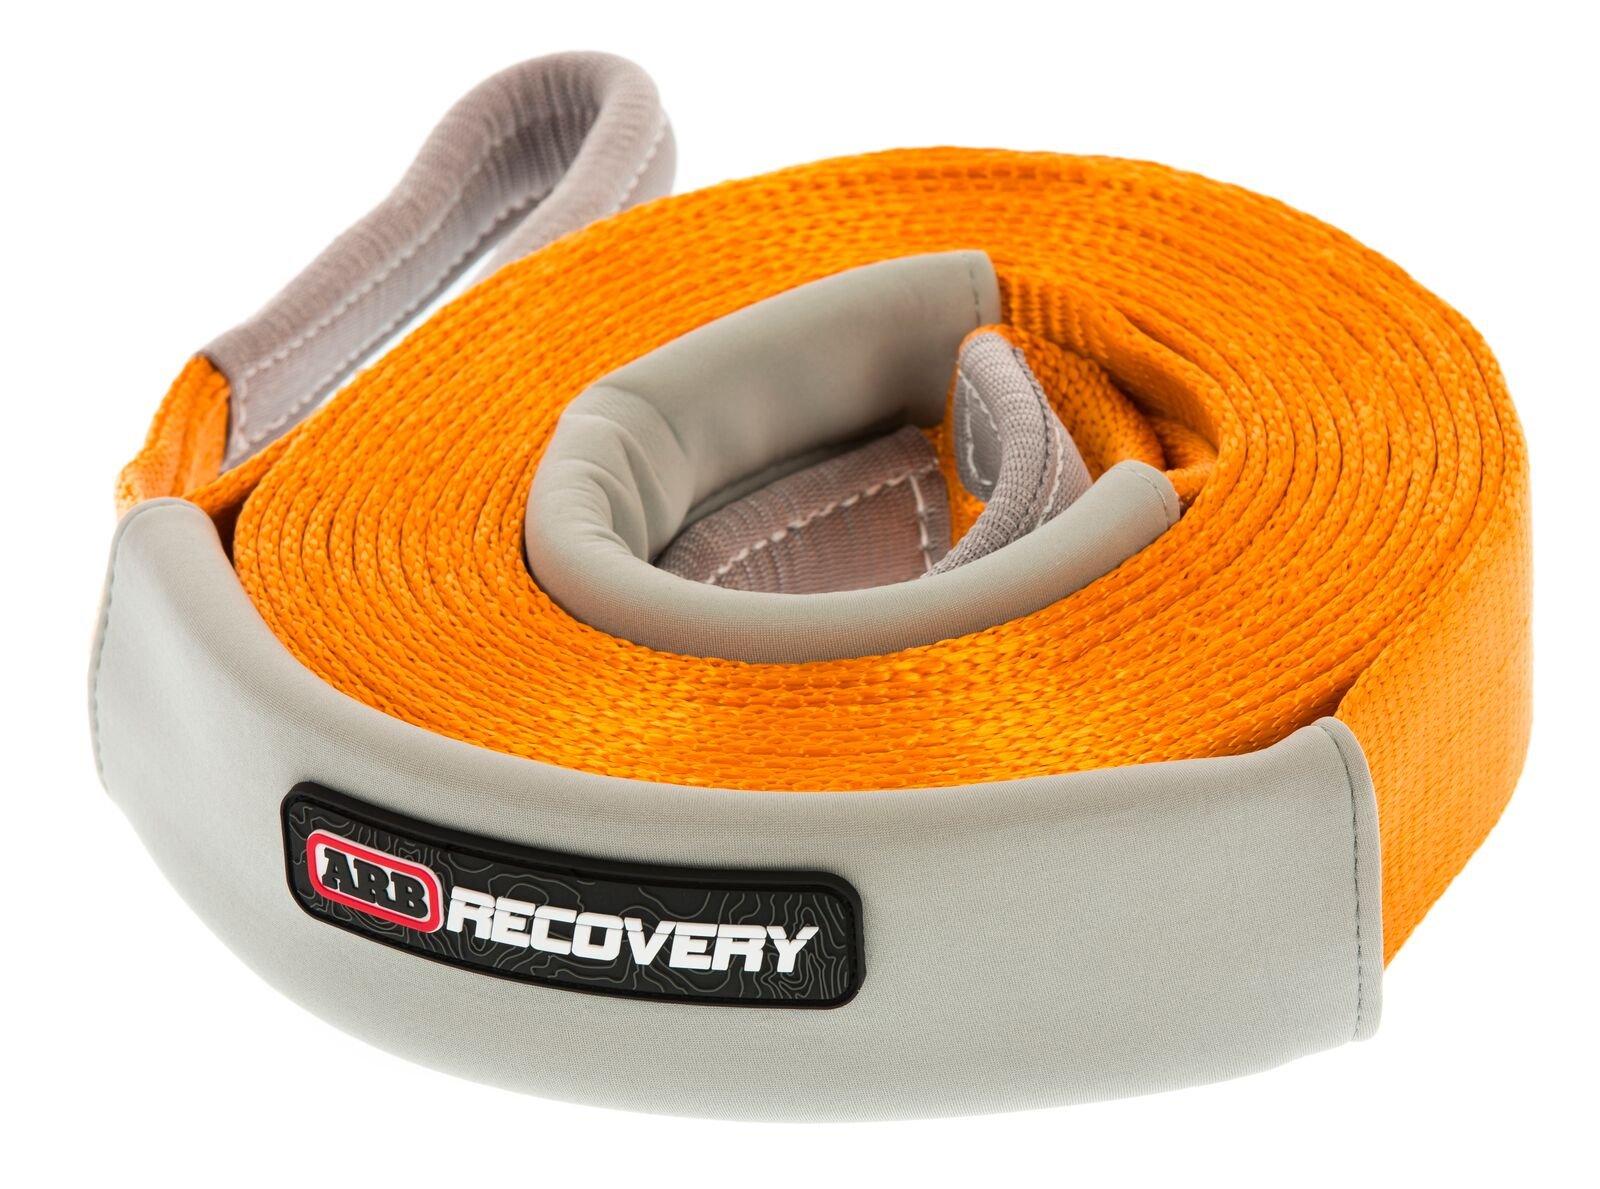 "ARB 4x4 Accessories ARB705LB Orange 30' x 2 3/8"" Snatch Strap Recovery, 1 Pack"